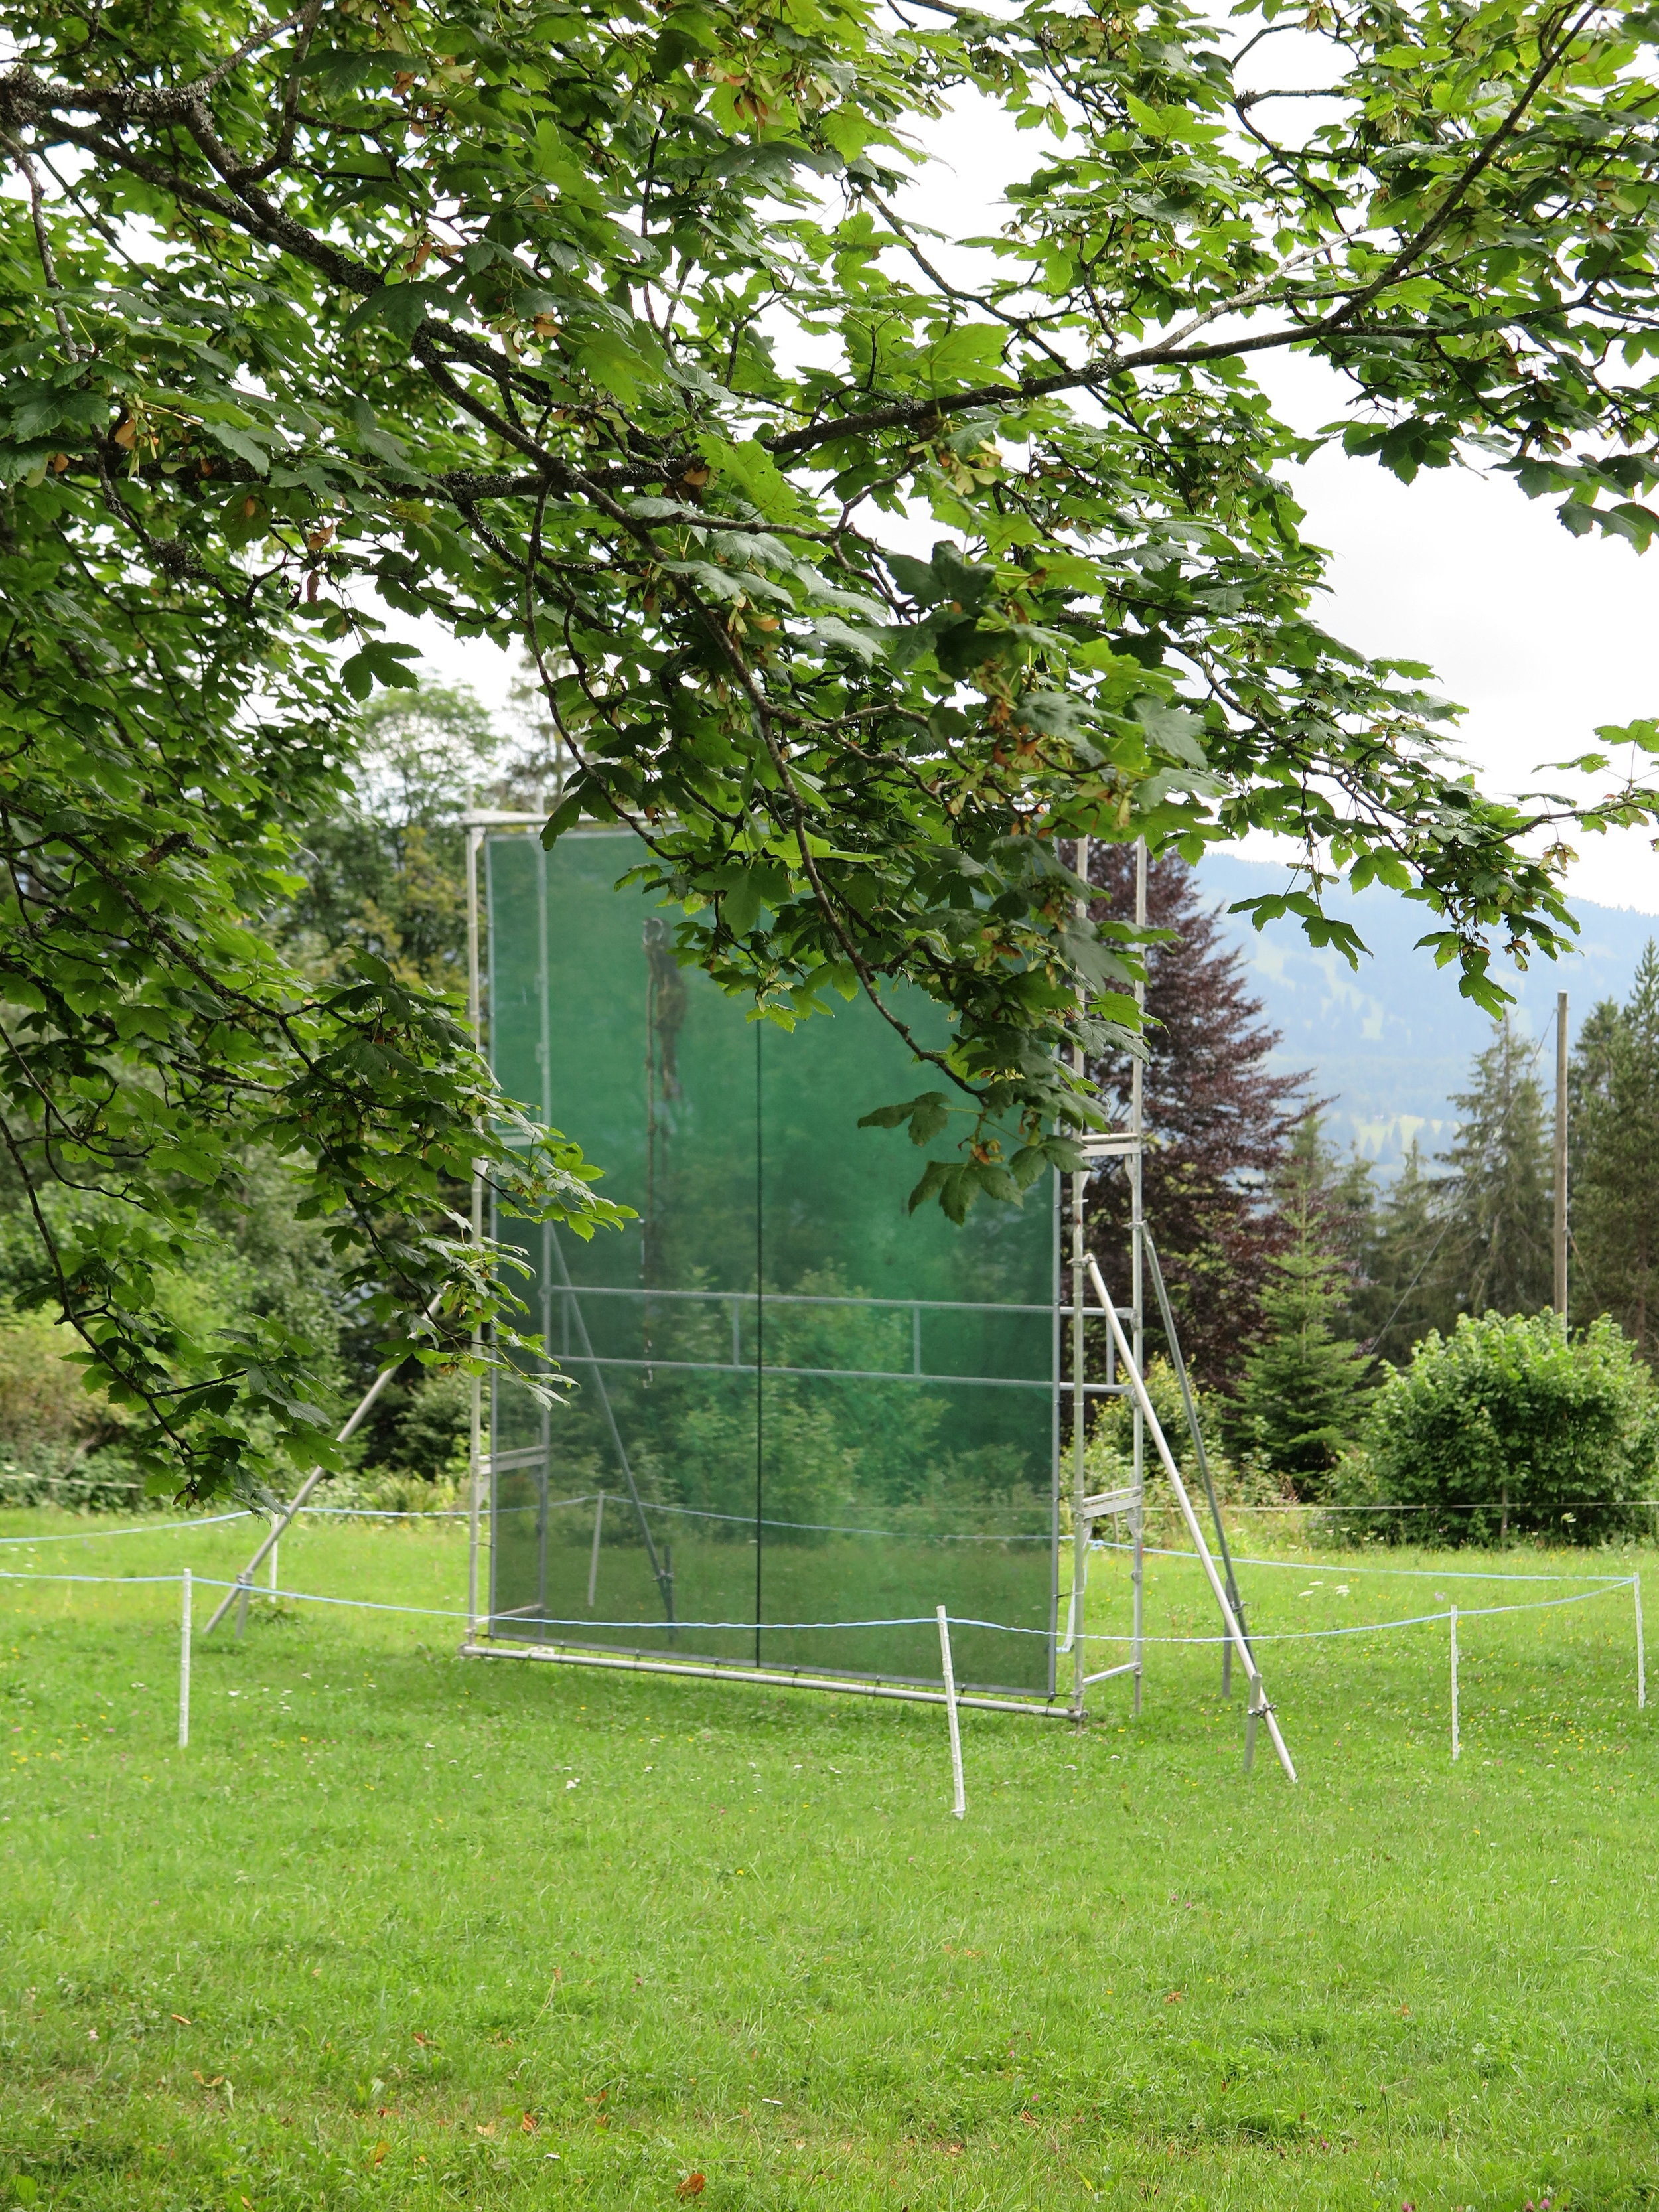 Deposit, Haras national d'avenches, Suisse | Yann Mingard